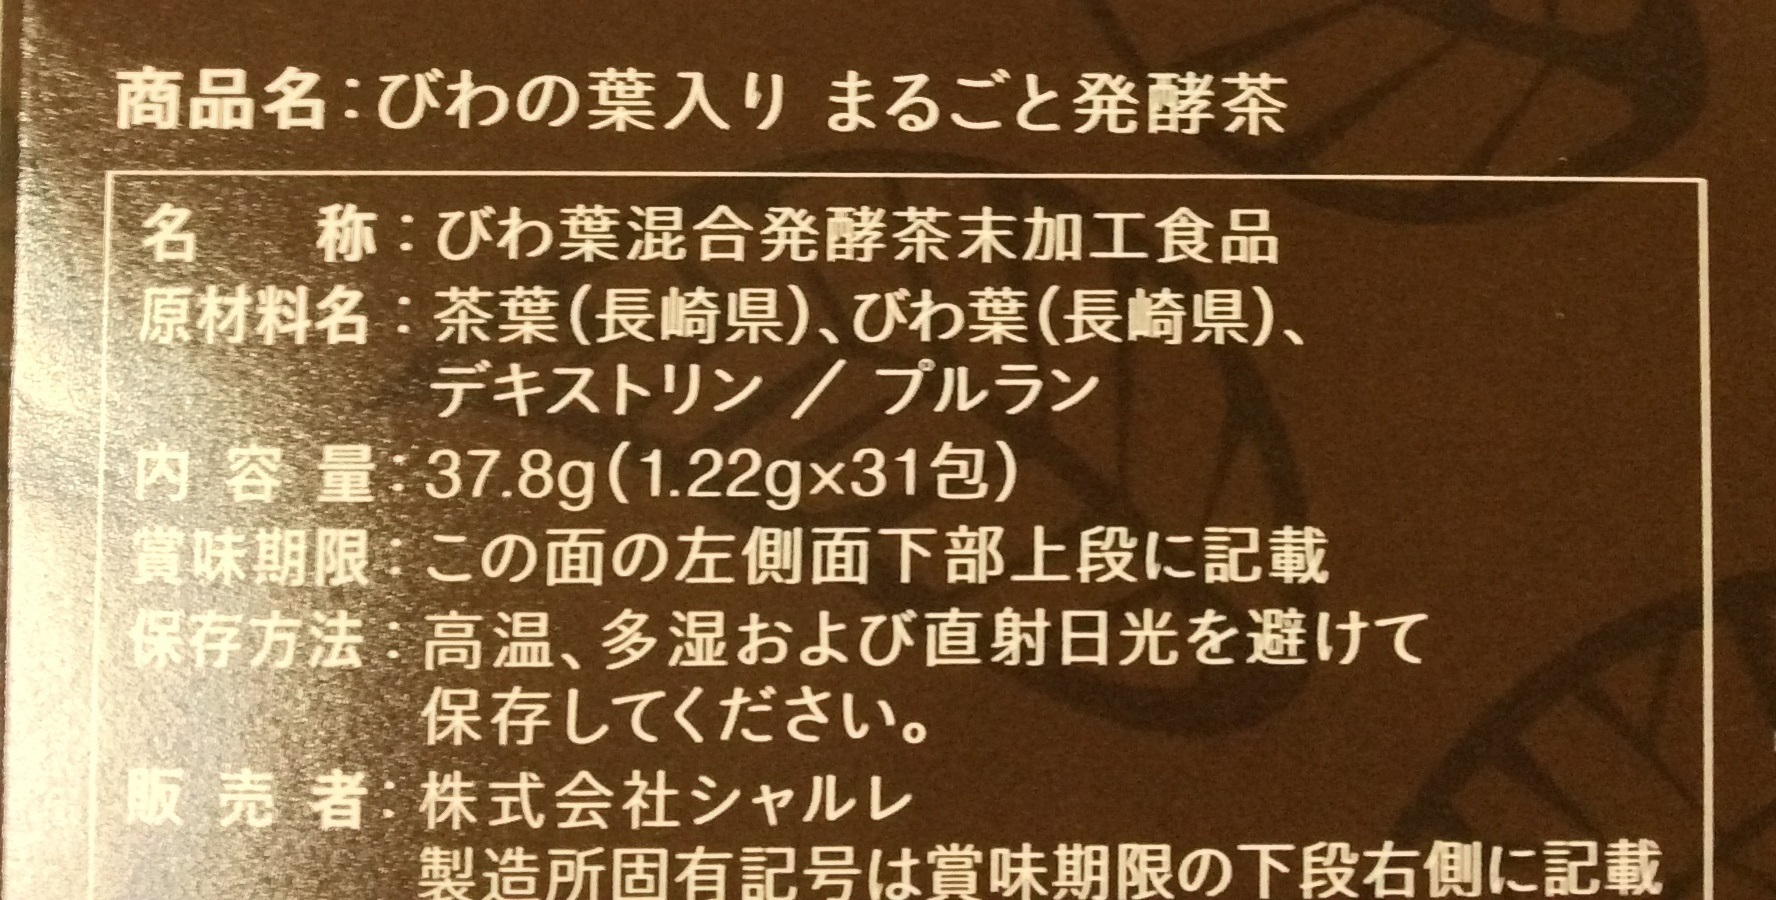 22795649-9C61-43F7-A9F1-AEFCD66DCF9D.jpeg